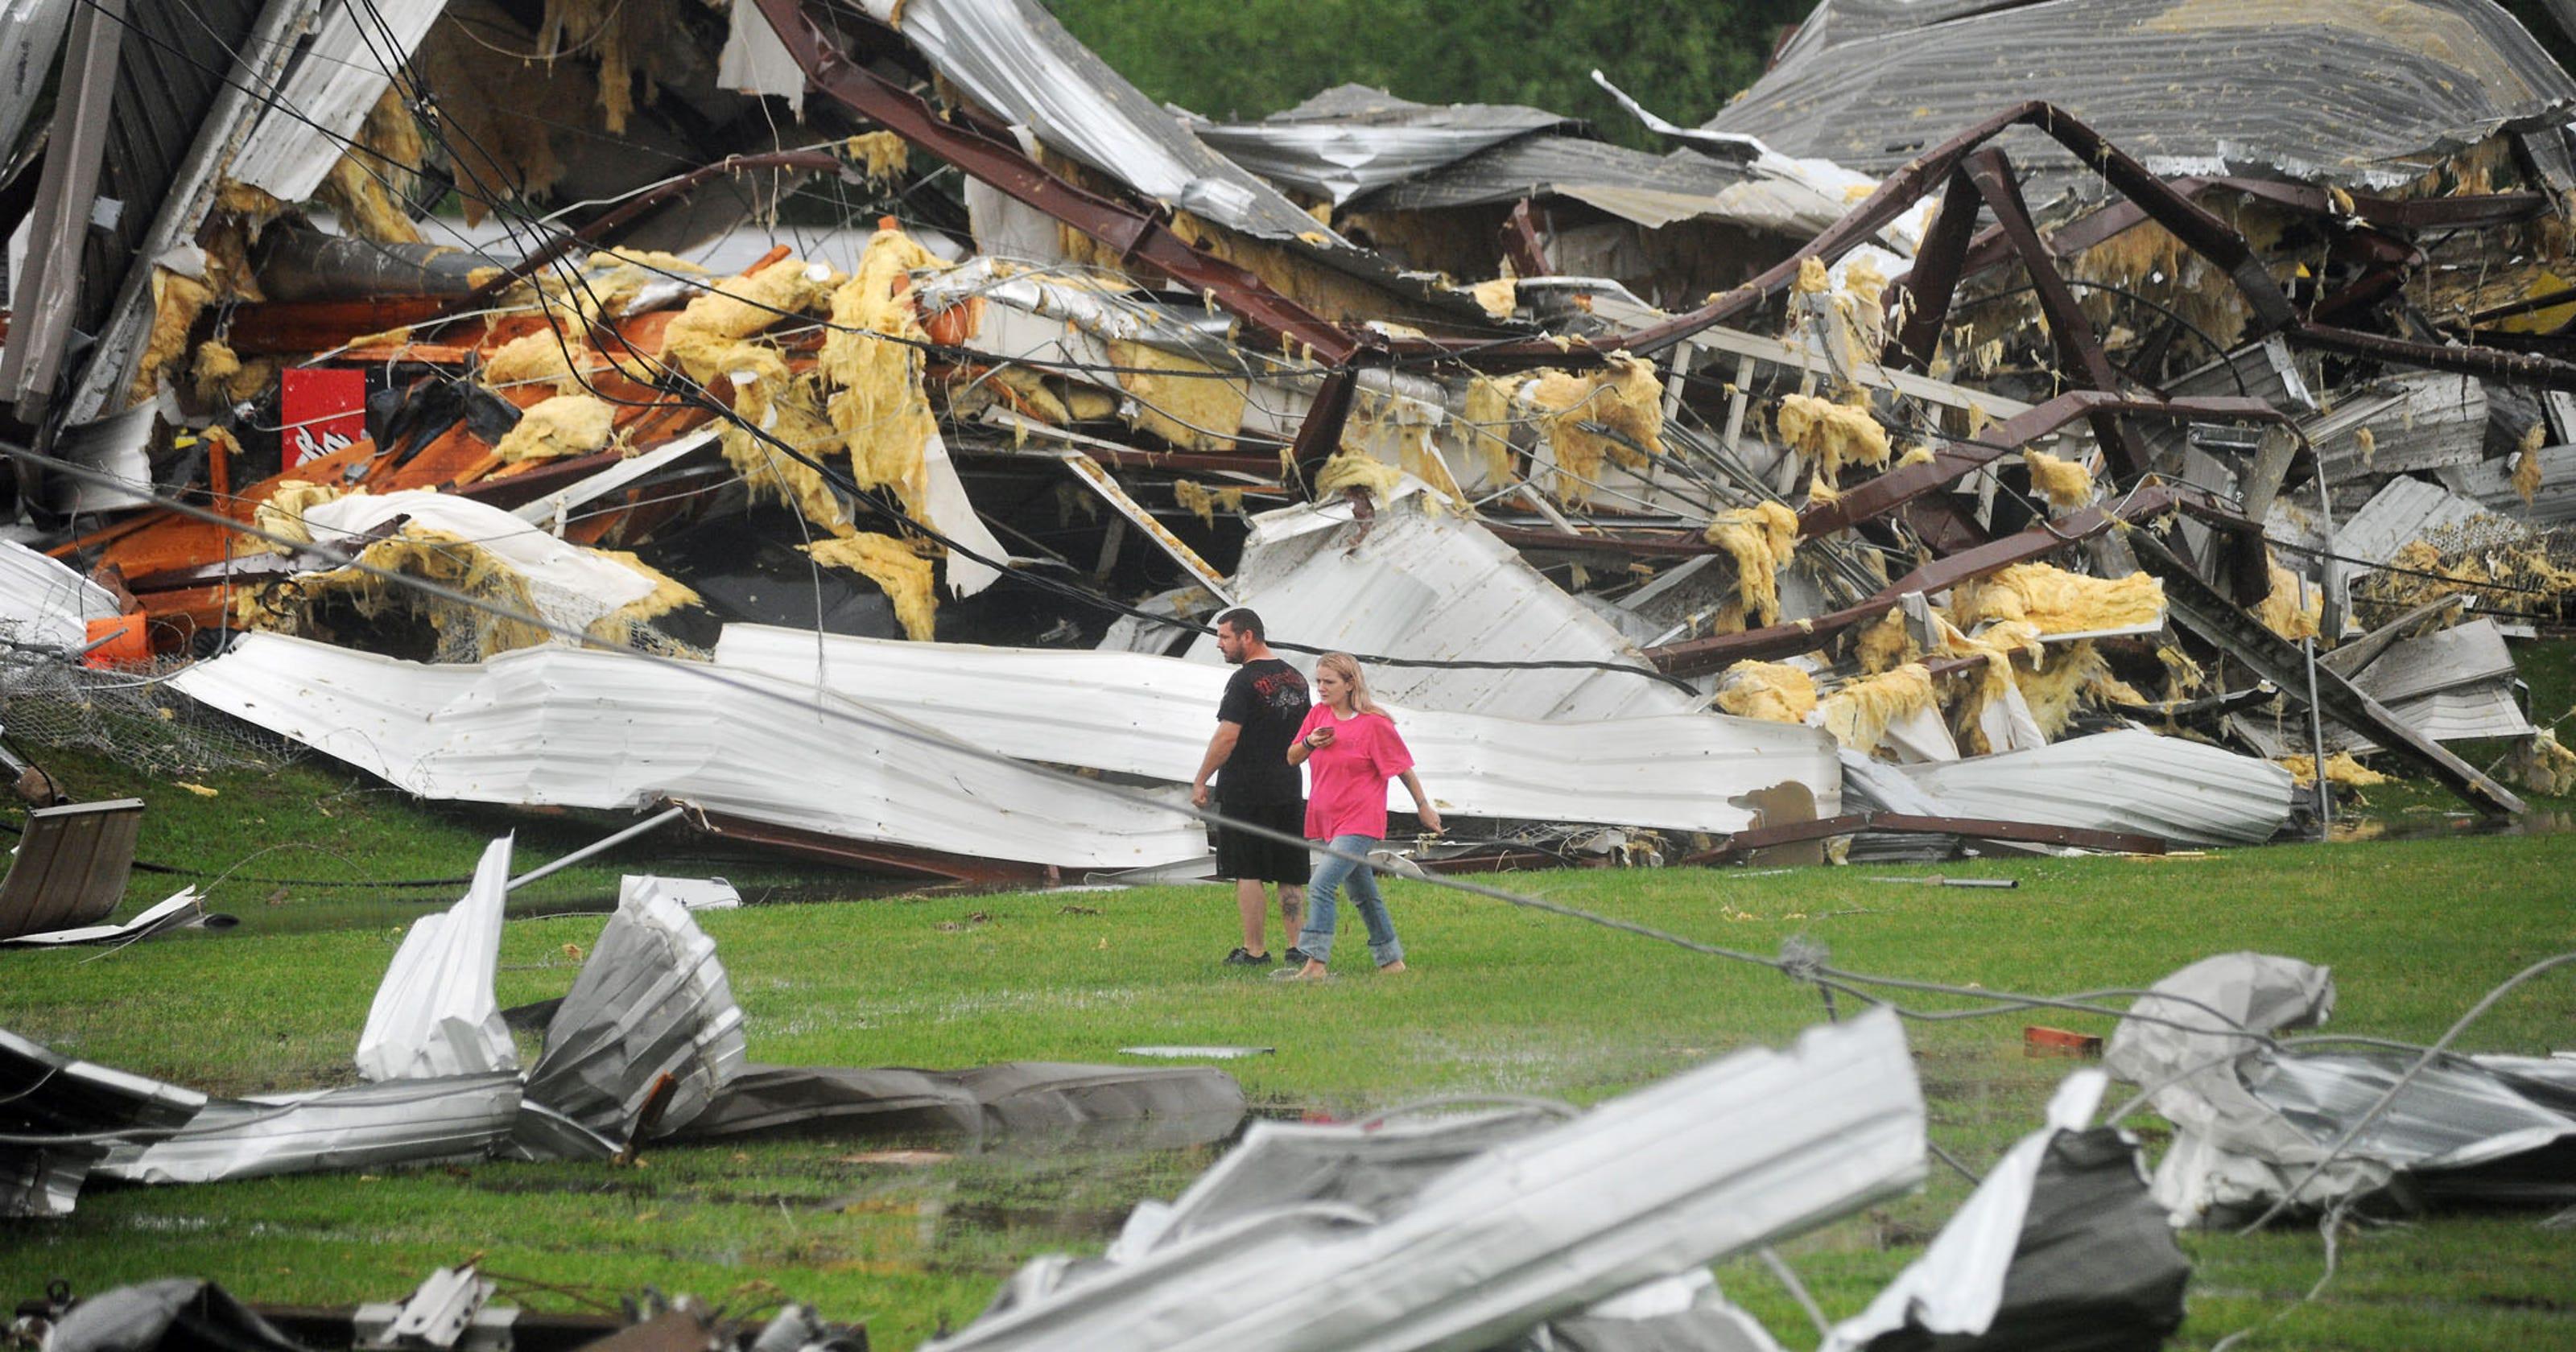 Tornadoes tear through South, add to death toll